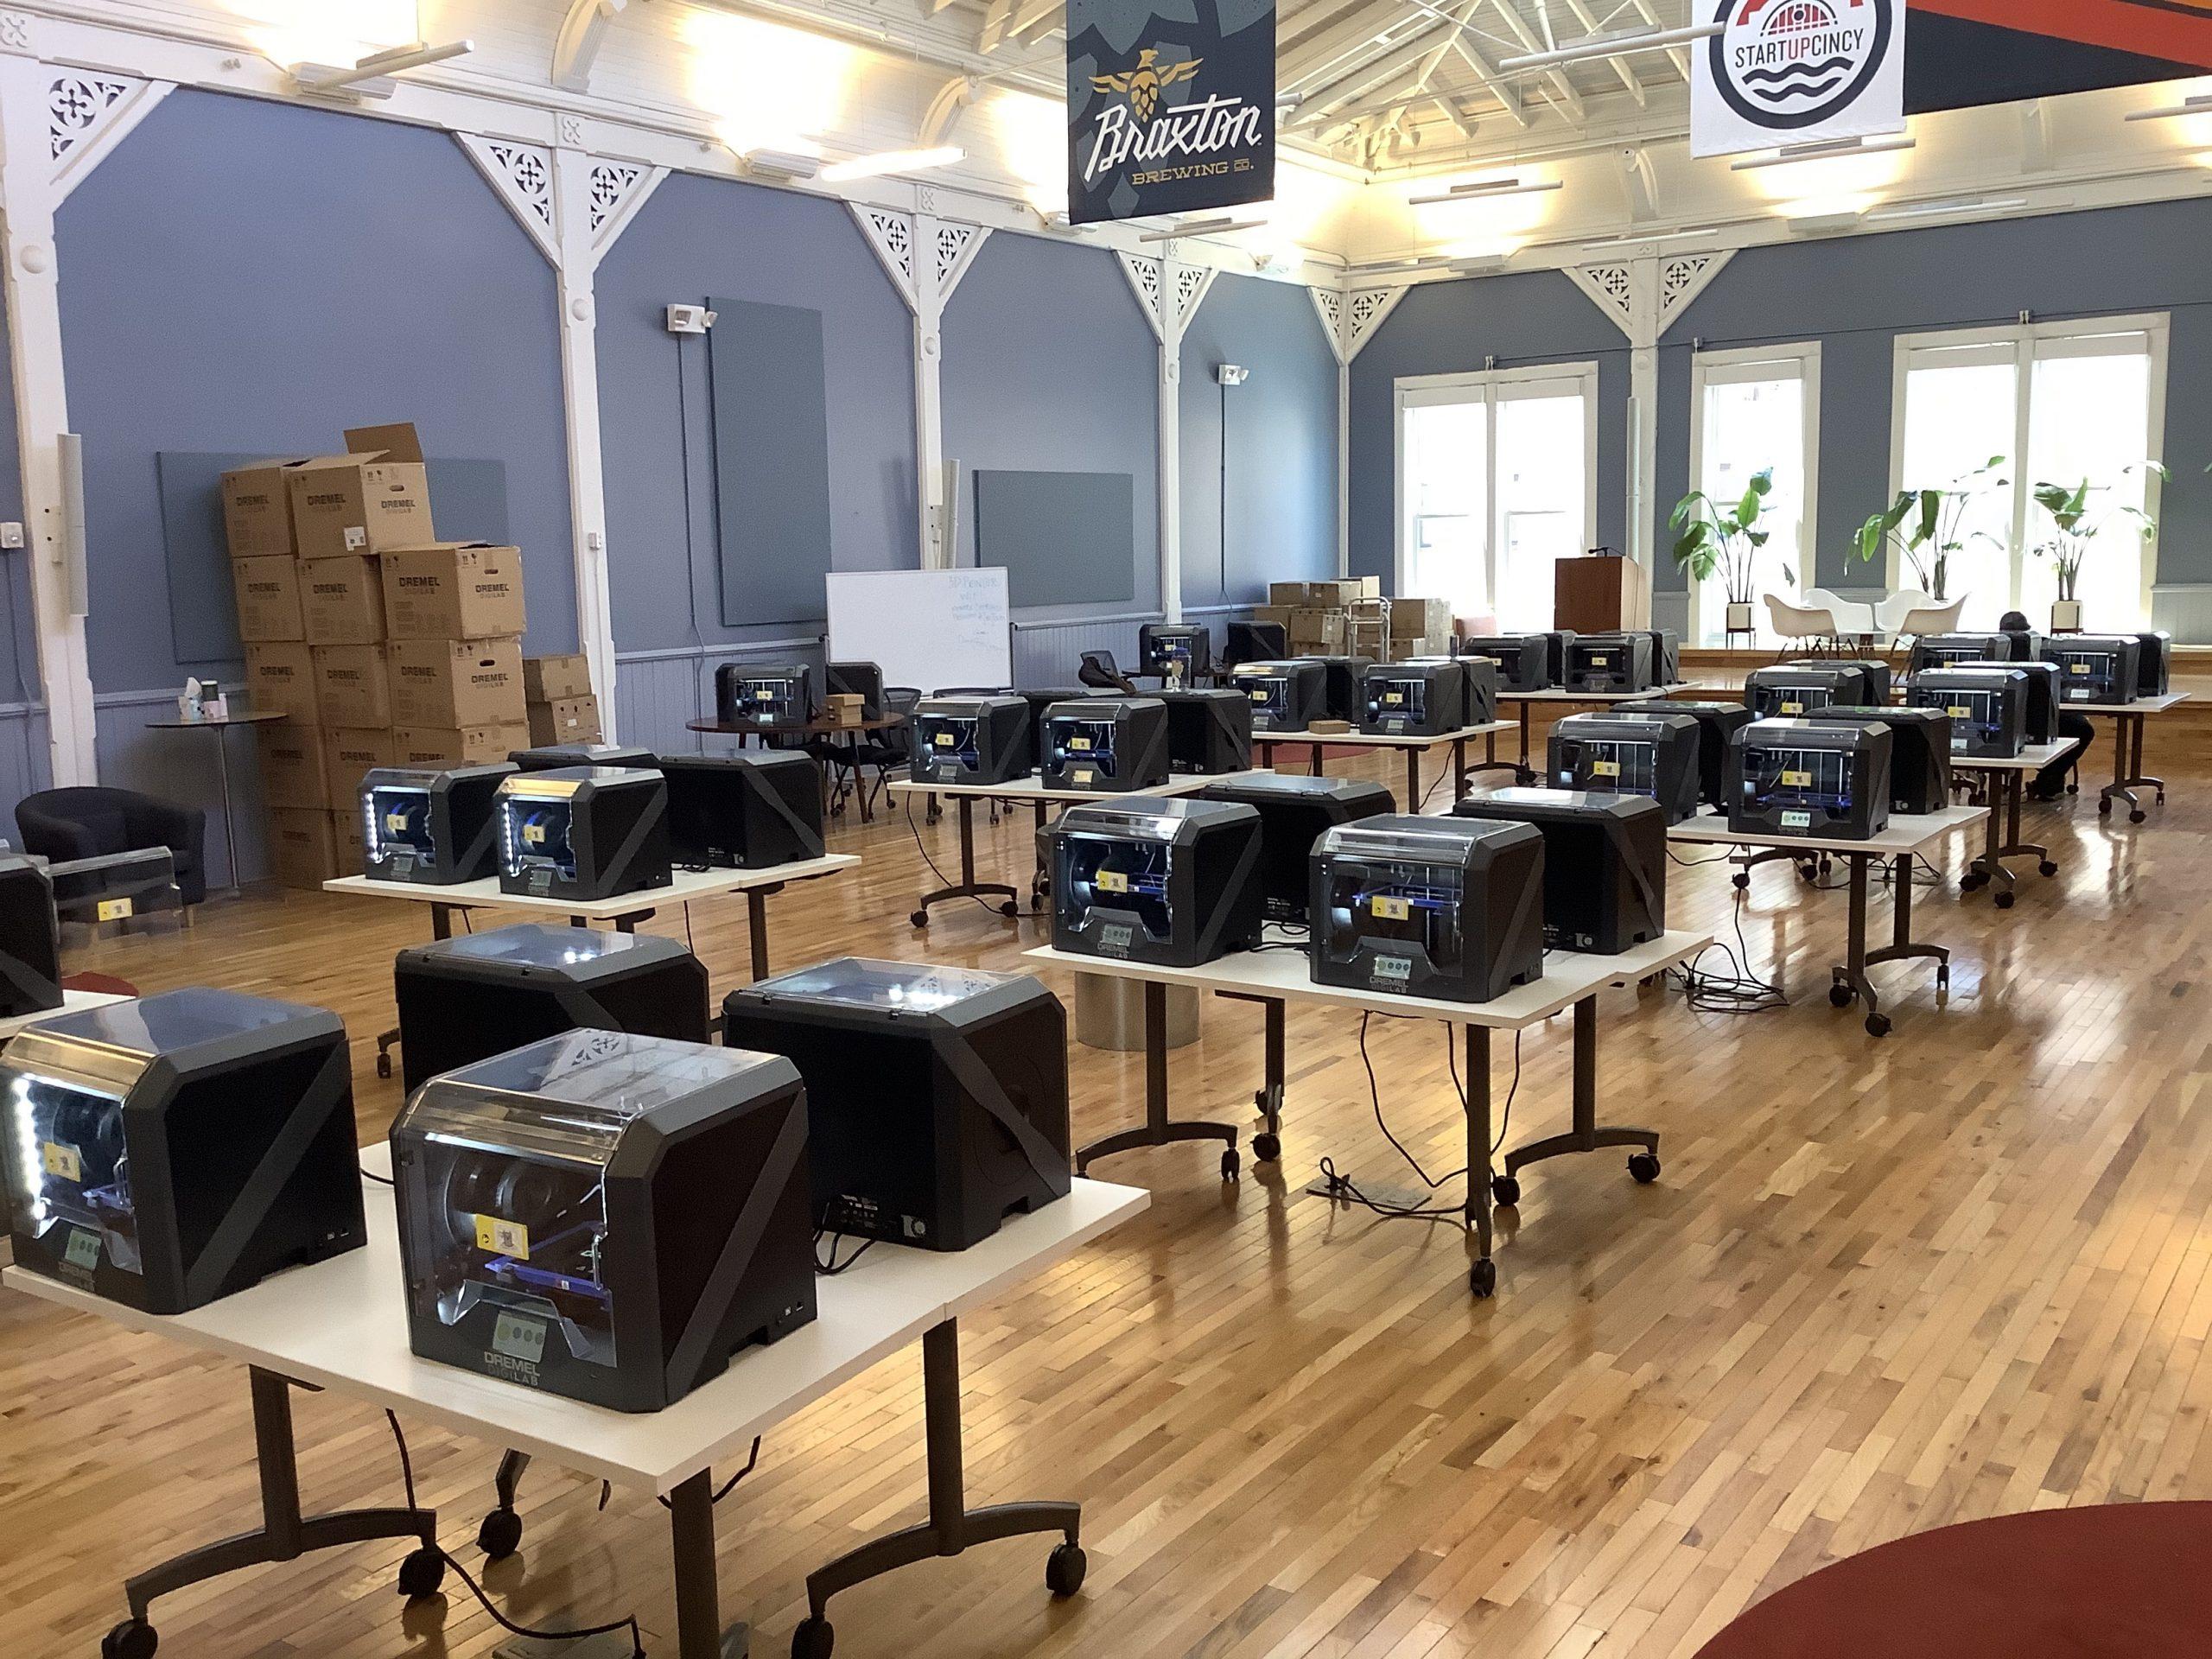 3D printers at Union Hall.